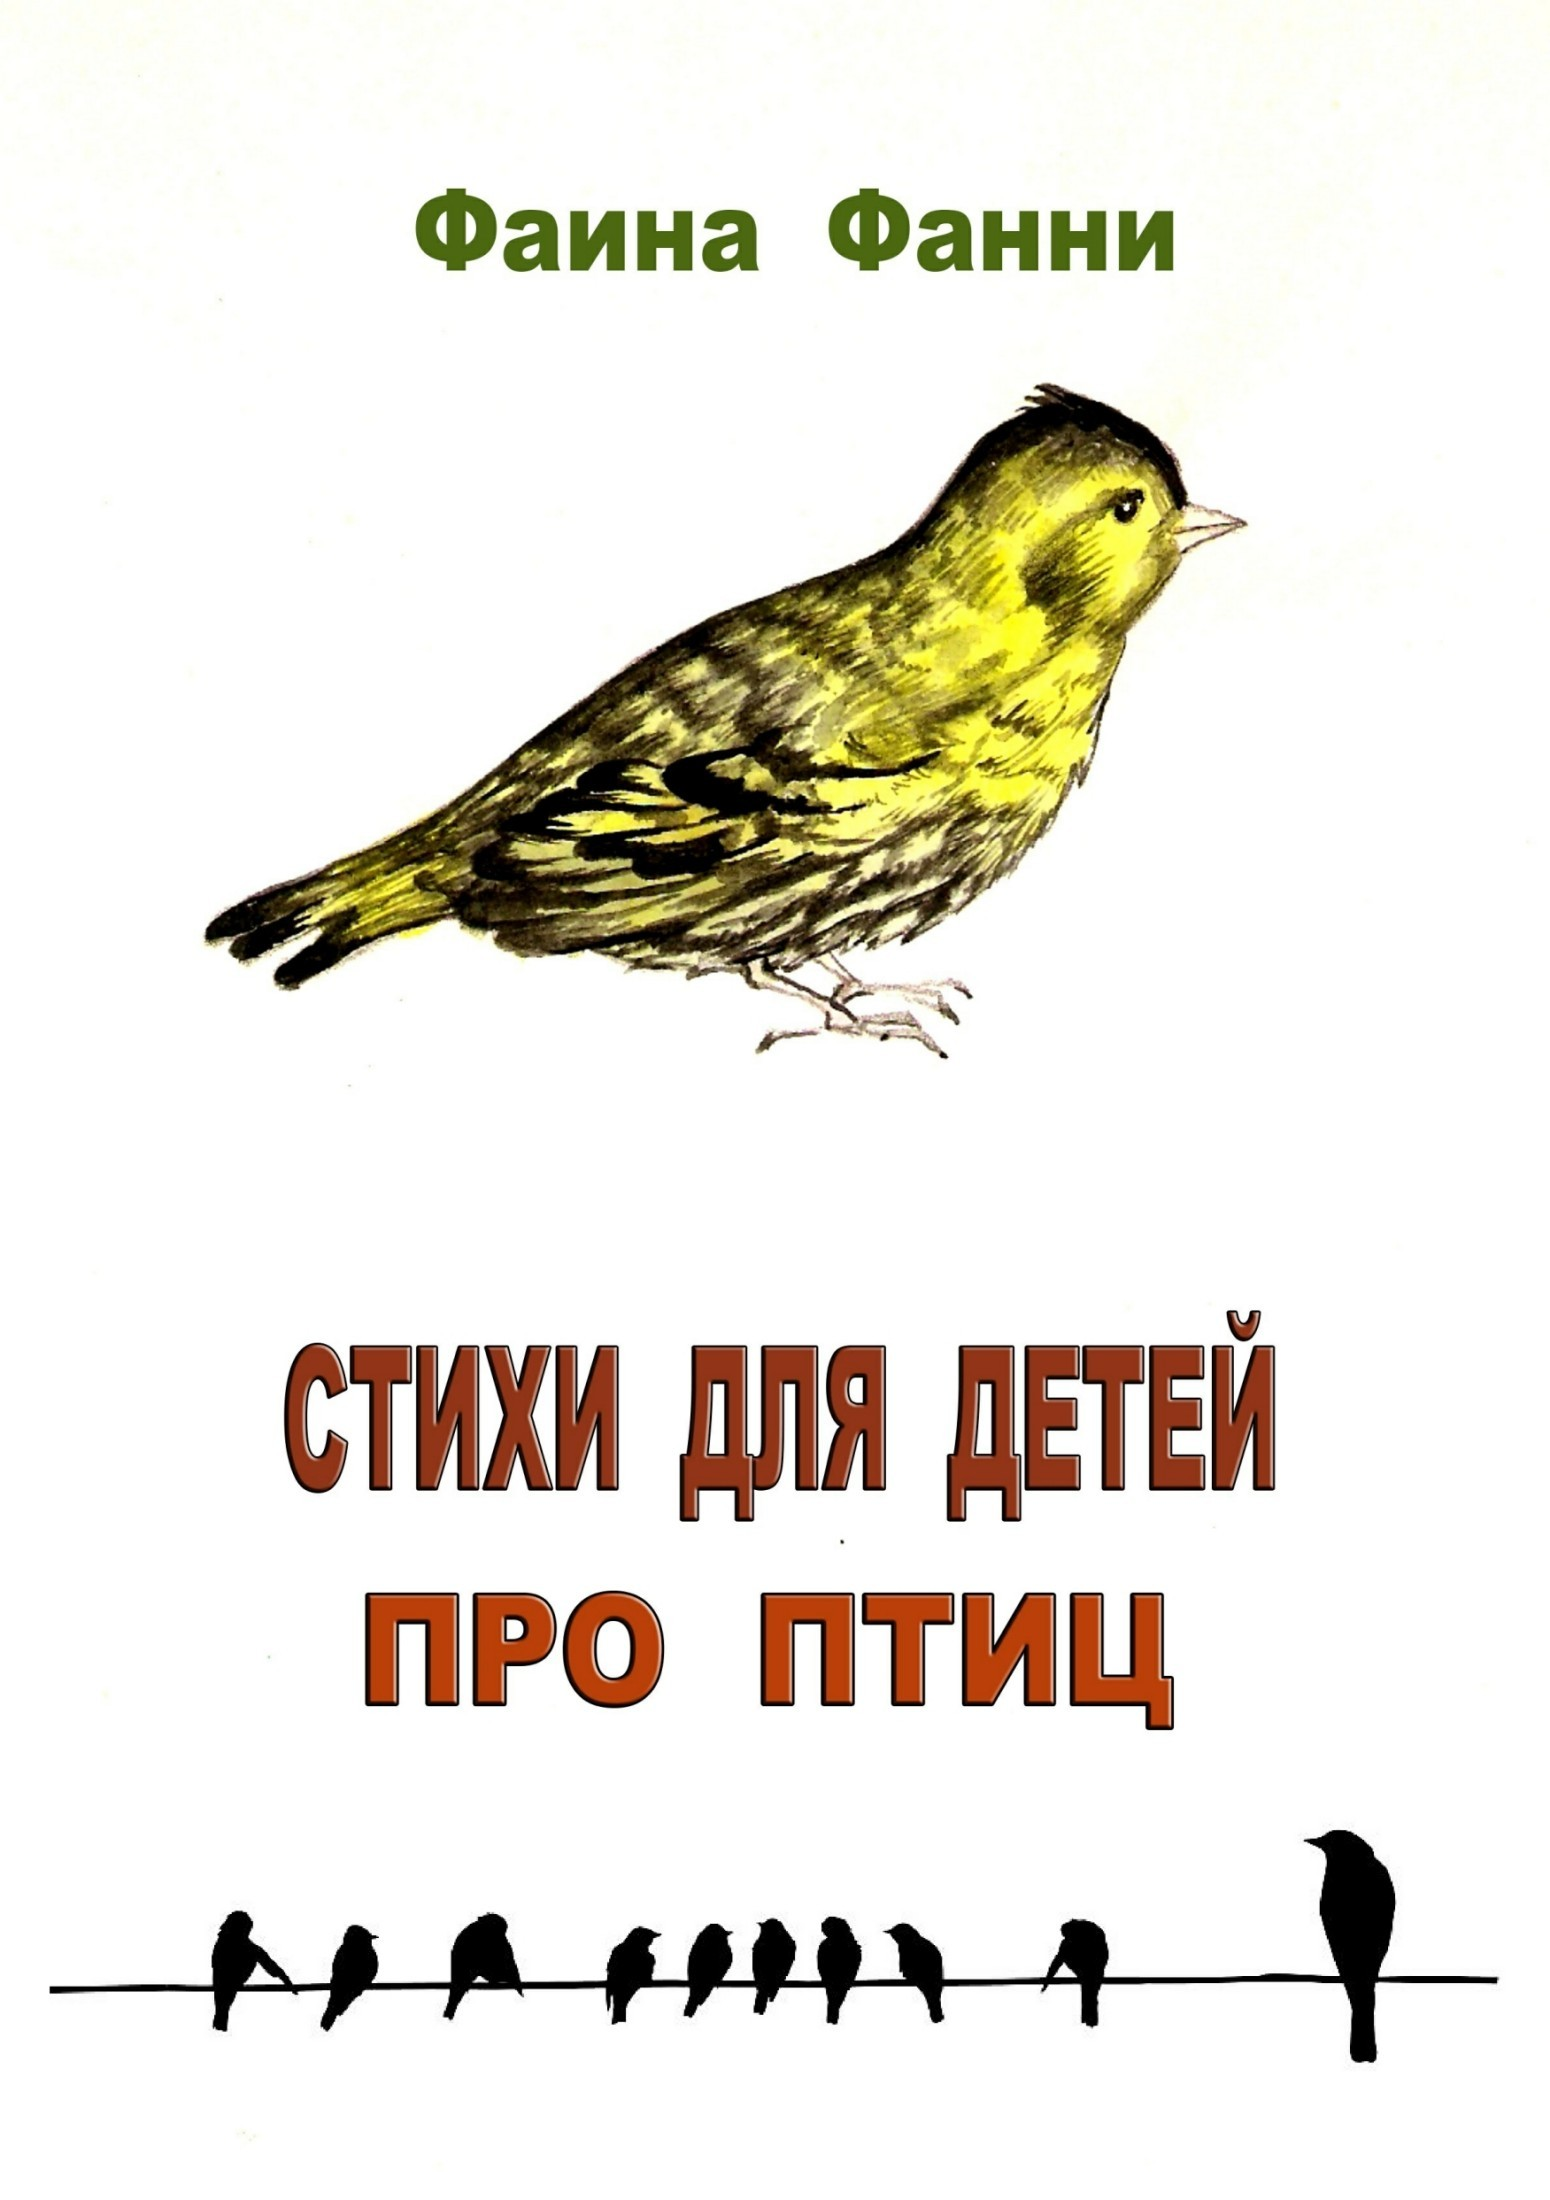 Фаина Фанни Стихи для детей про птиц фаина фанни стихи для детей про птиц